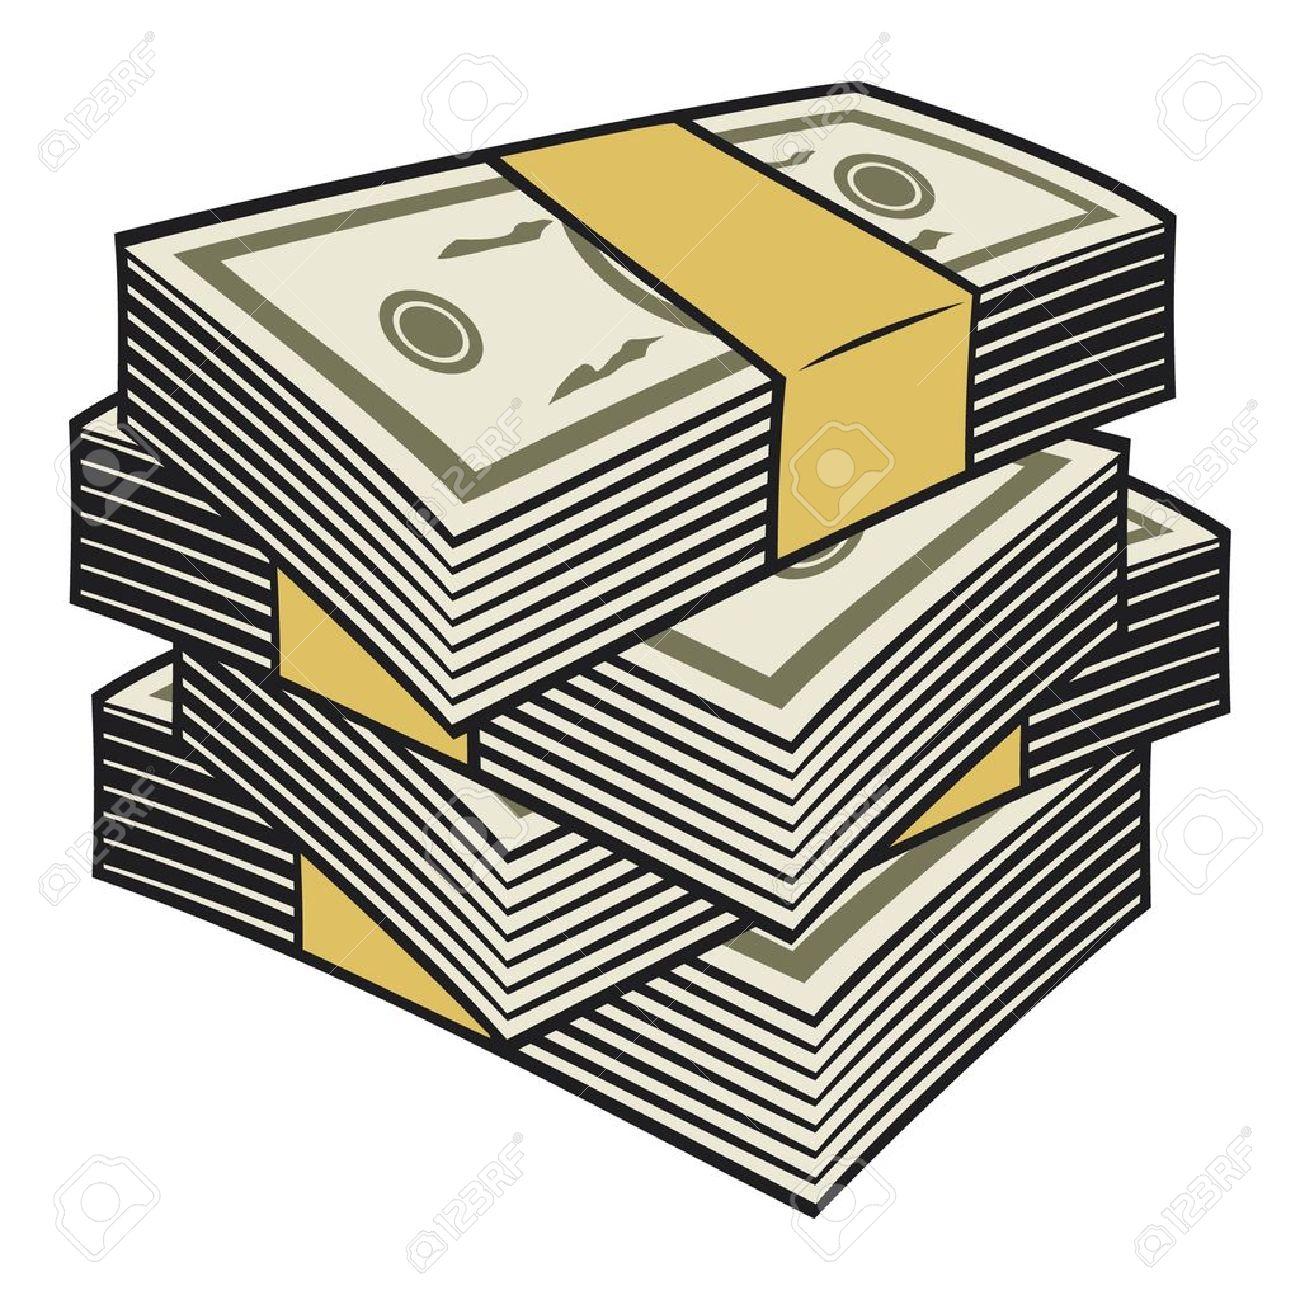 Money Stacks Clipart.